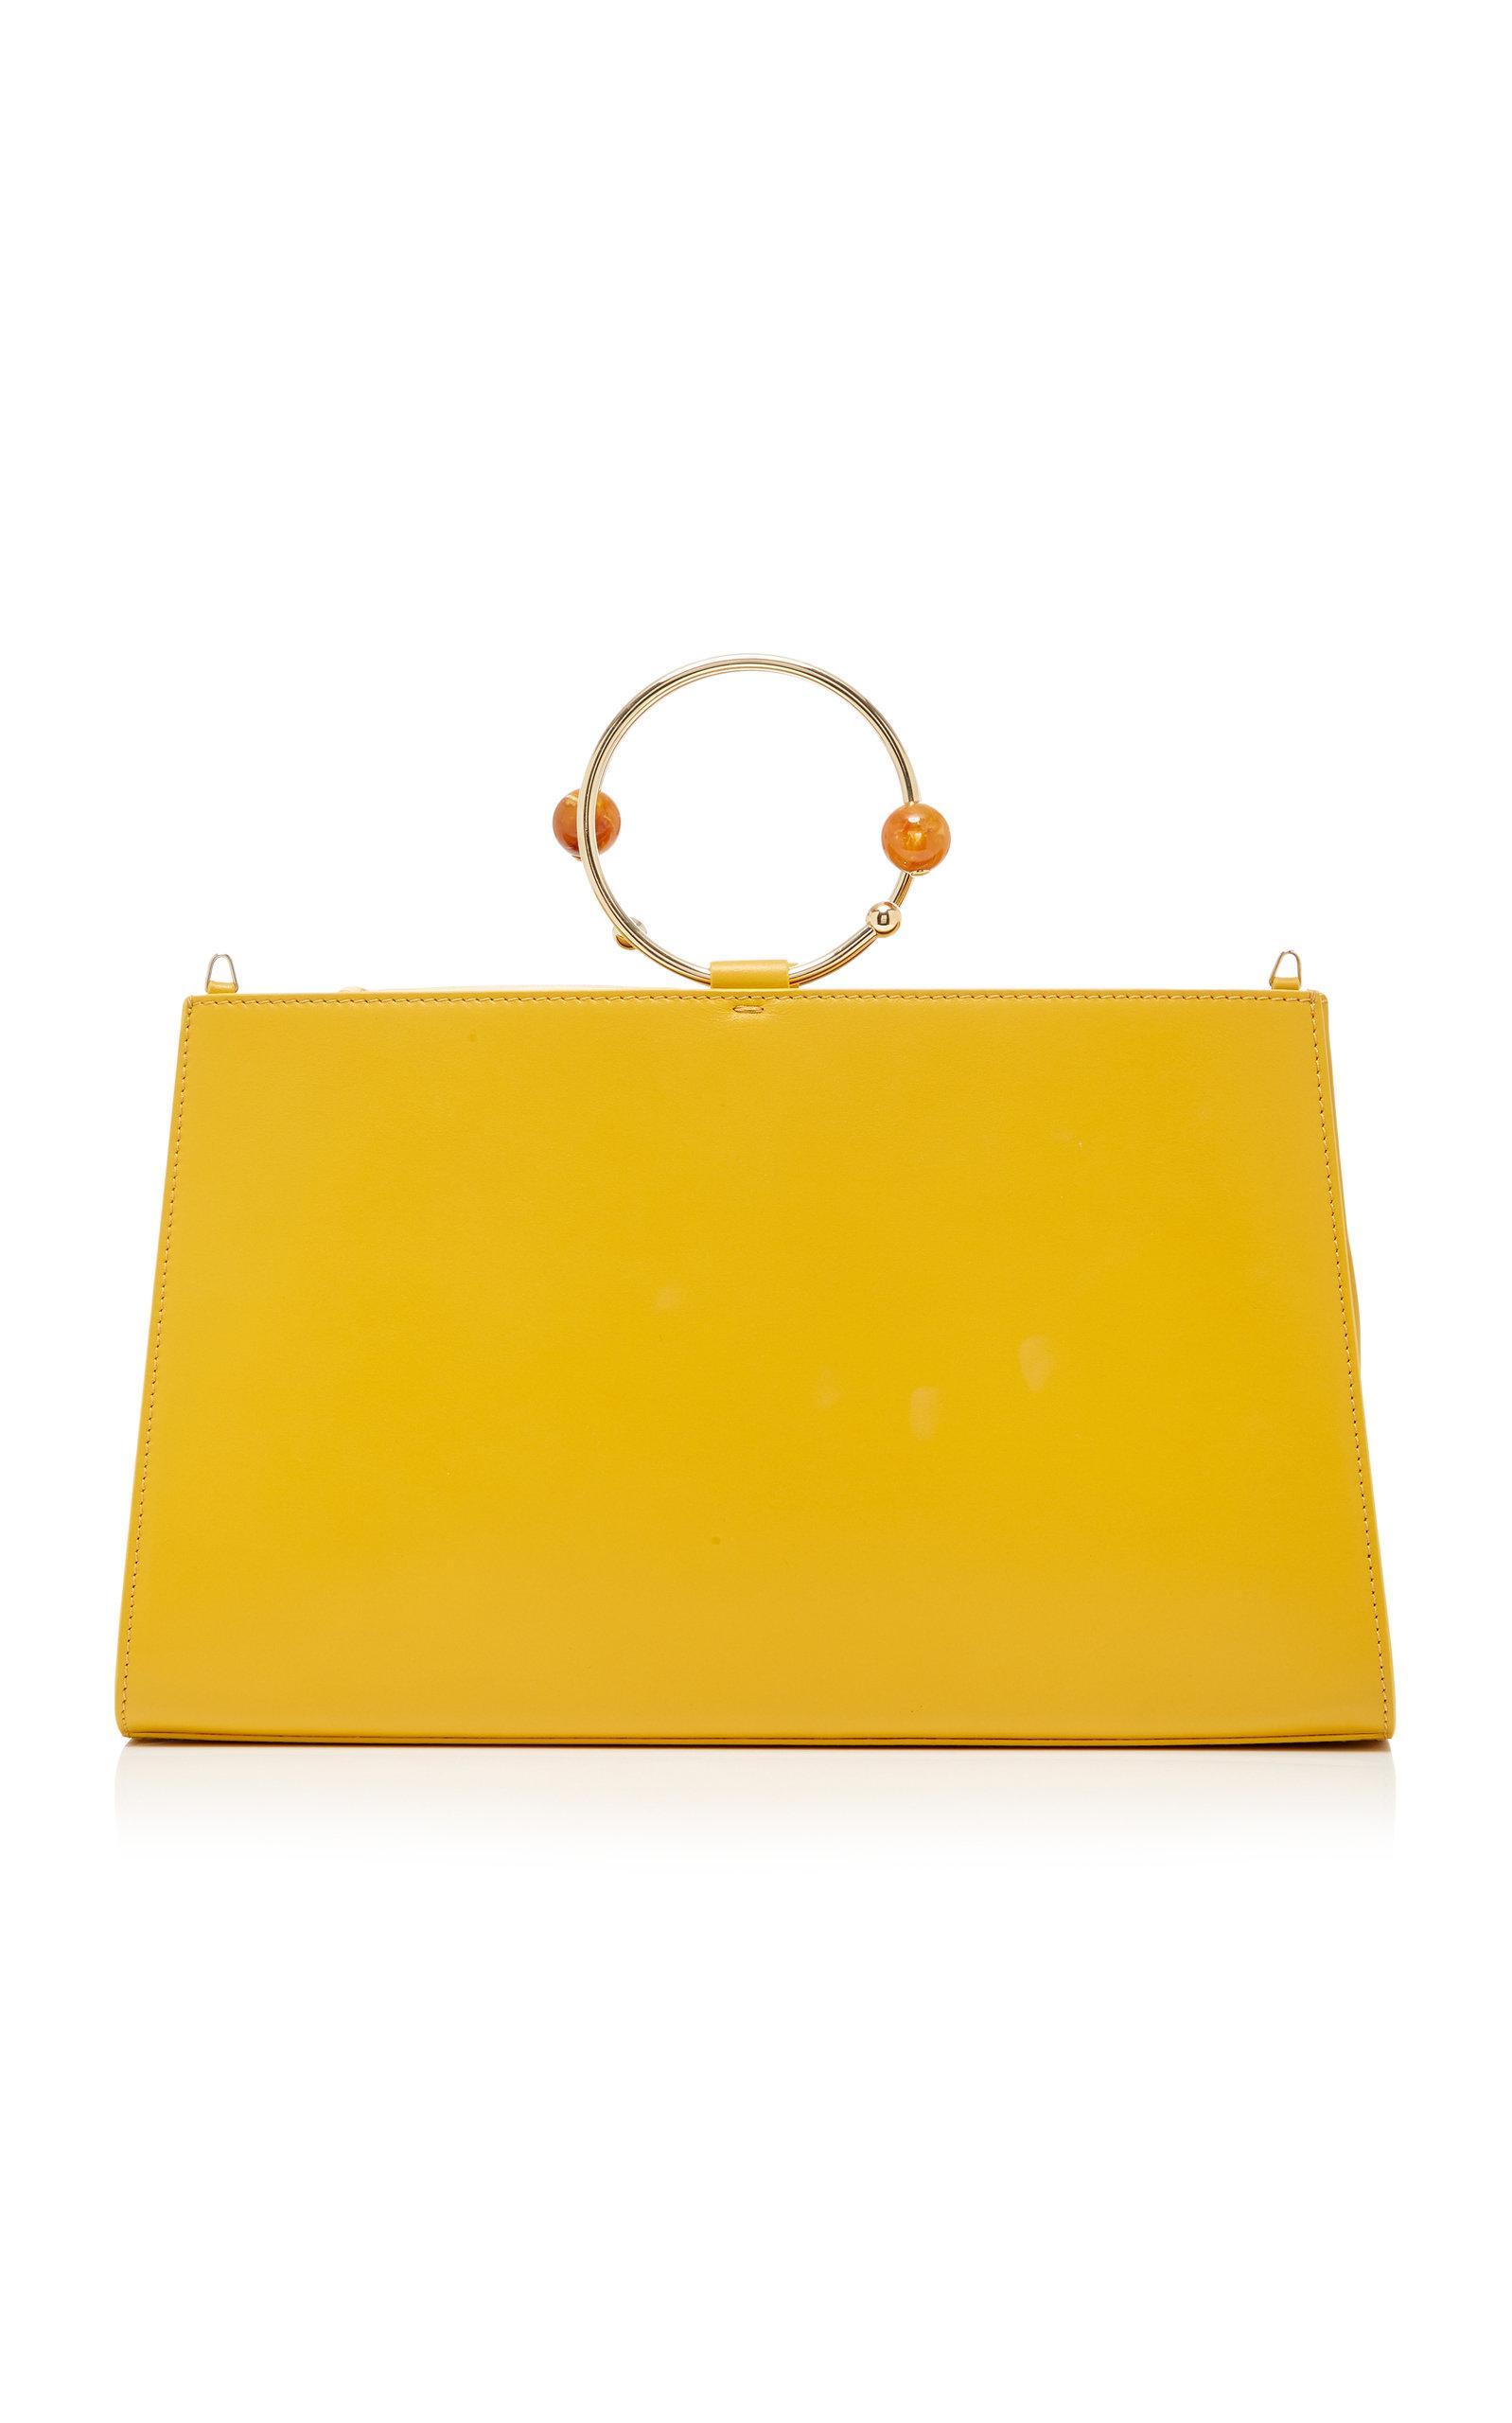 Adeam Art Frame Bag In Yellow